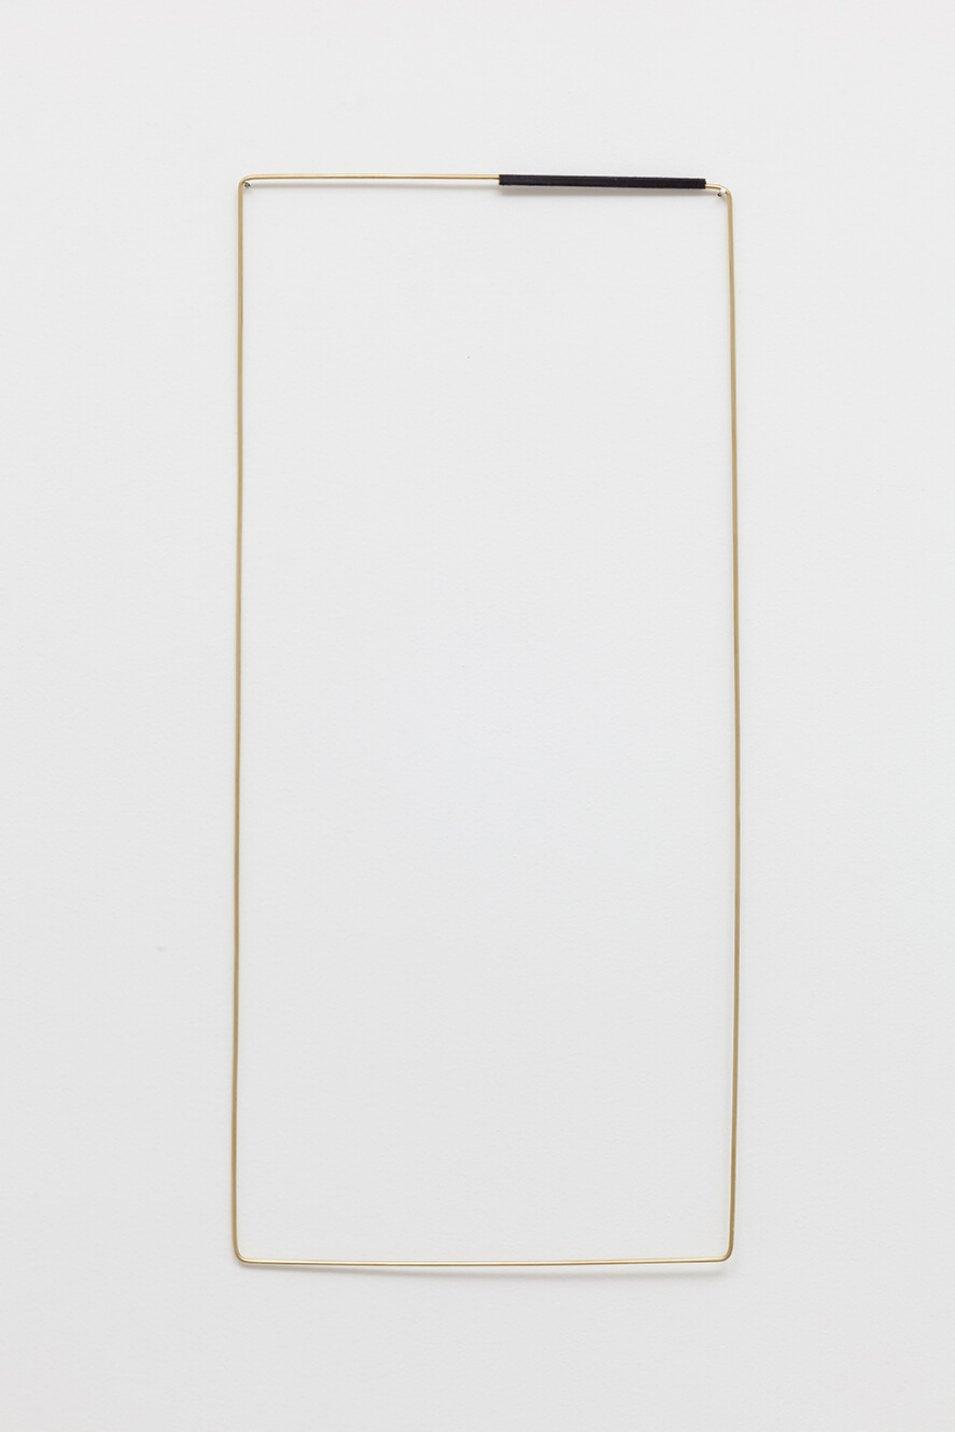 Paloma Bosquê,<em>Field</em>, 2016, brass rods and black thread, 70 × 32 cm - Mendes Wood DM